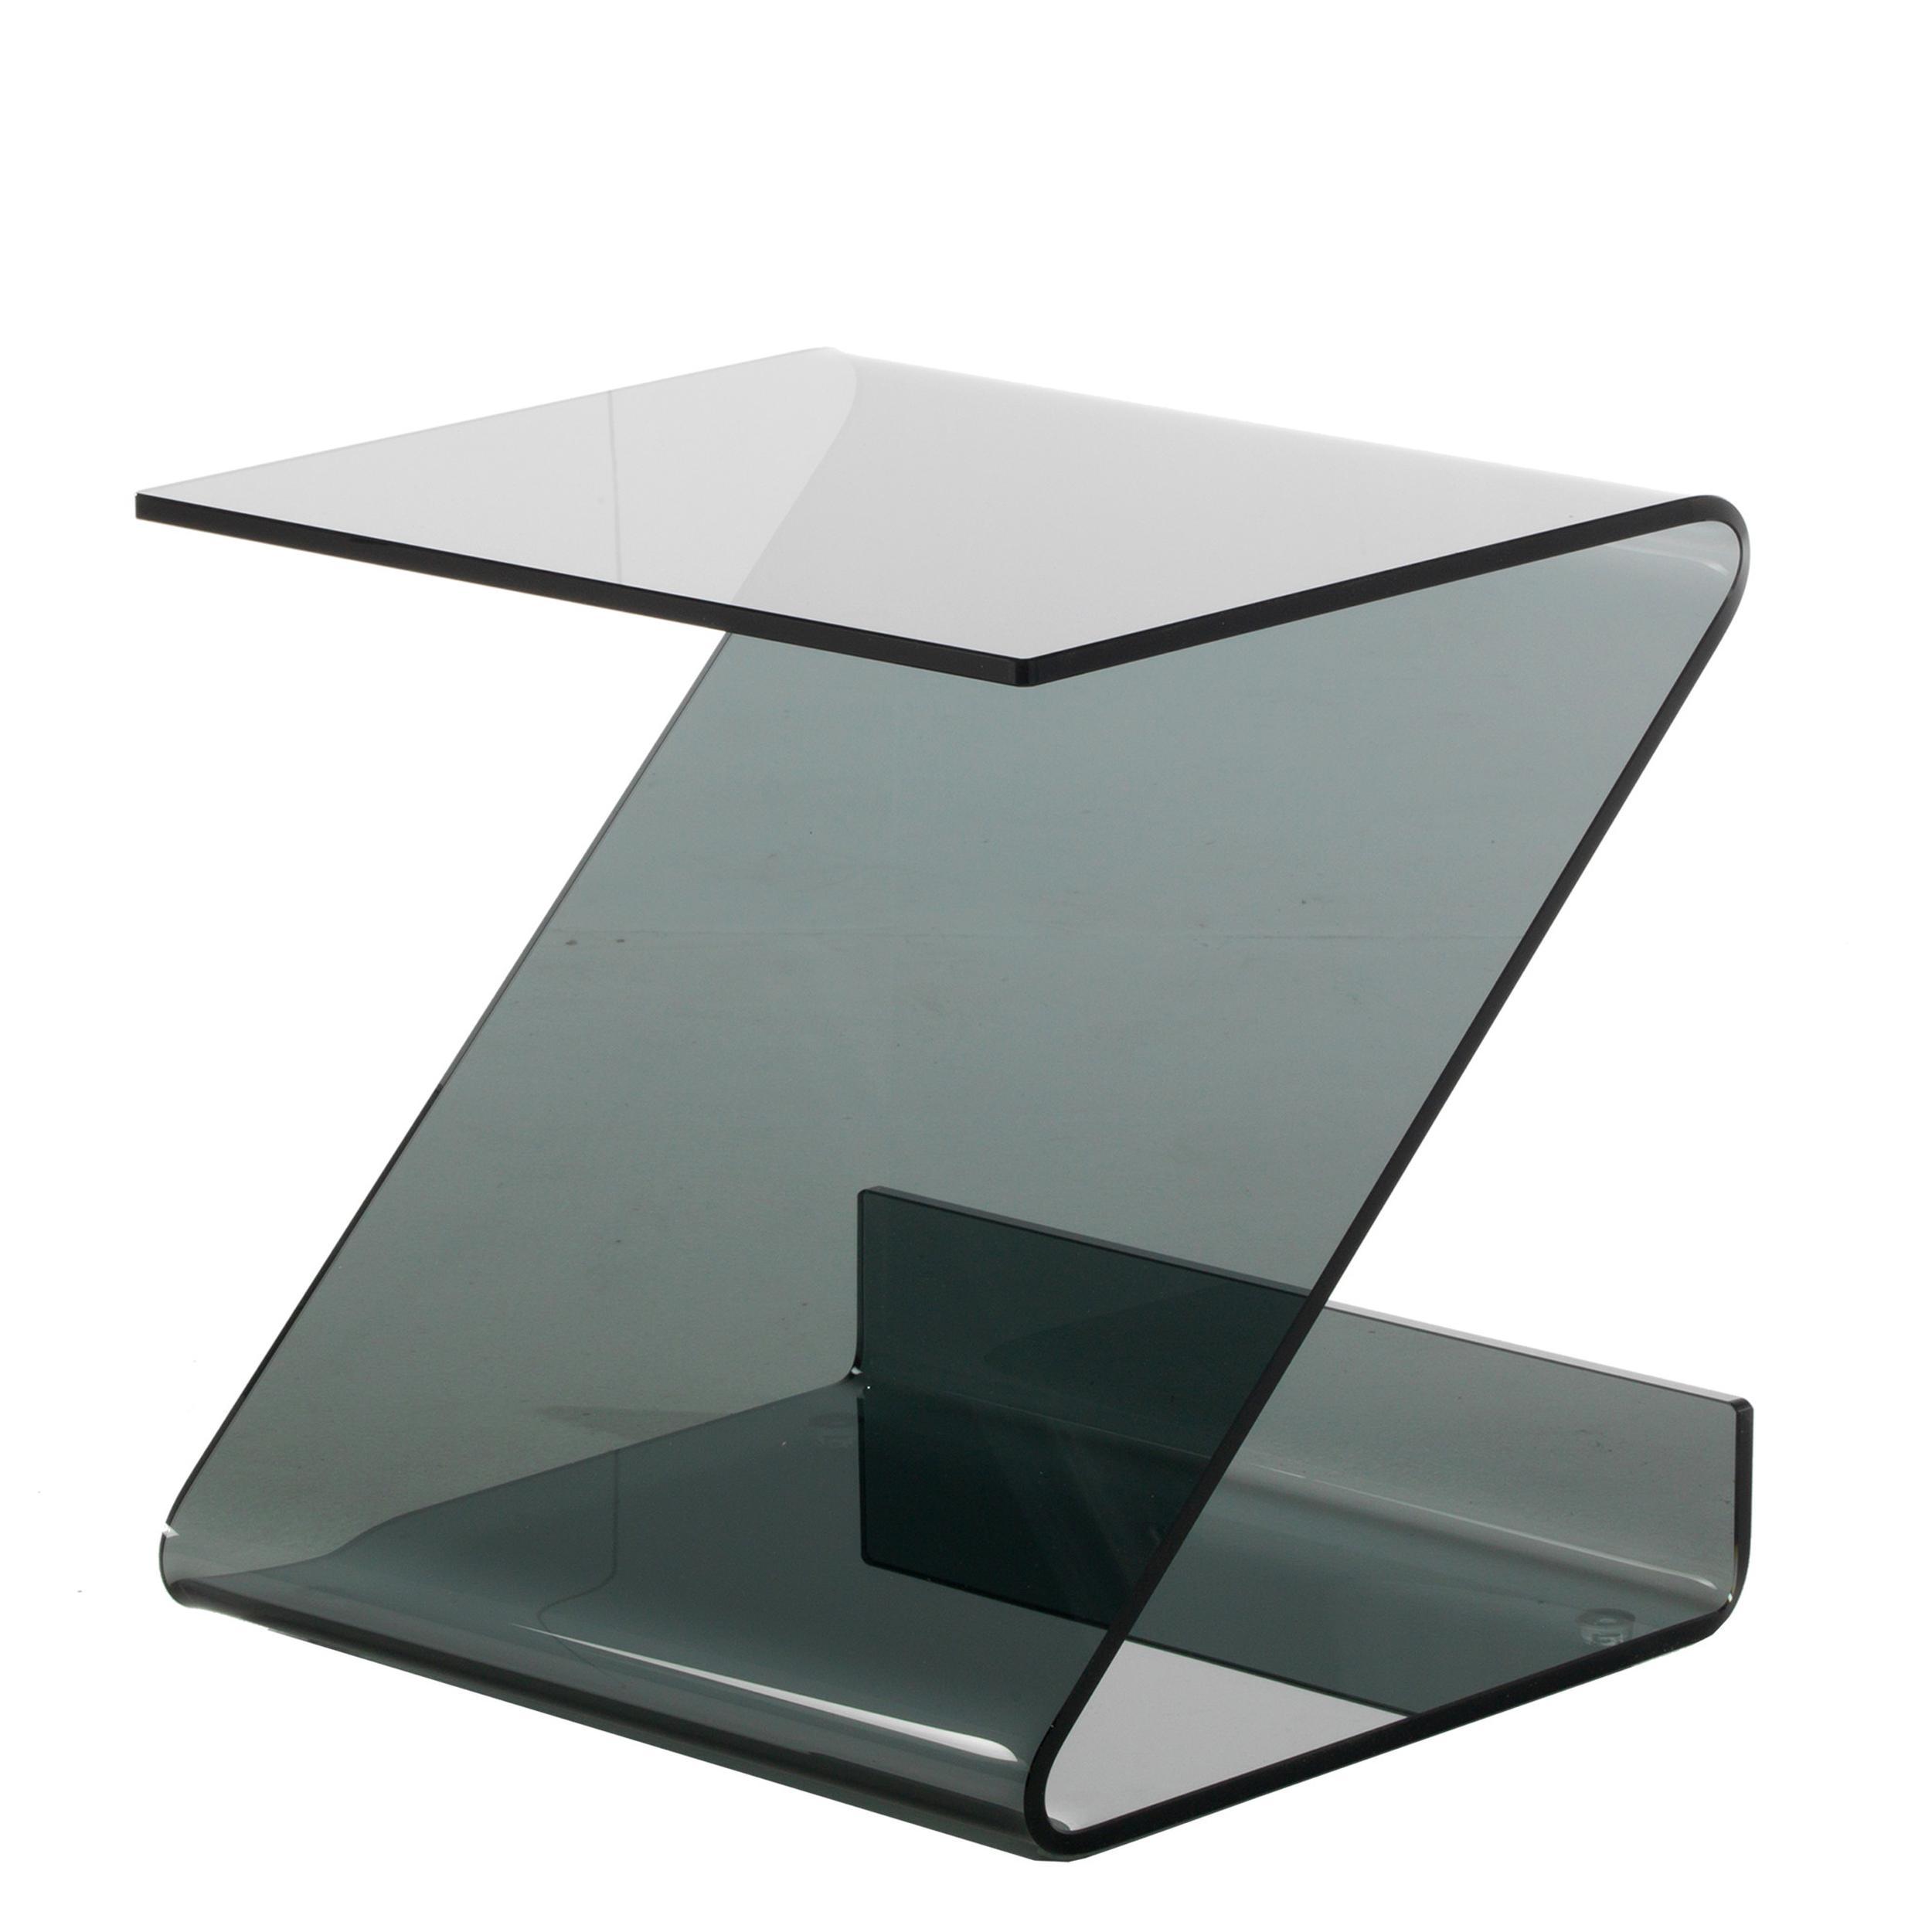 tavolino in vetro Curvato grigio 10 mm 45x39xh45 cm grigio trasparente |  Vetro Curvato